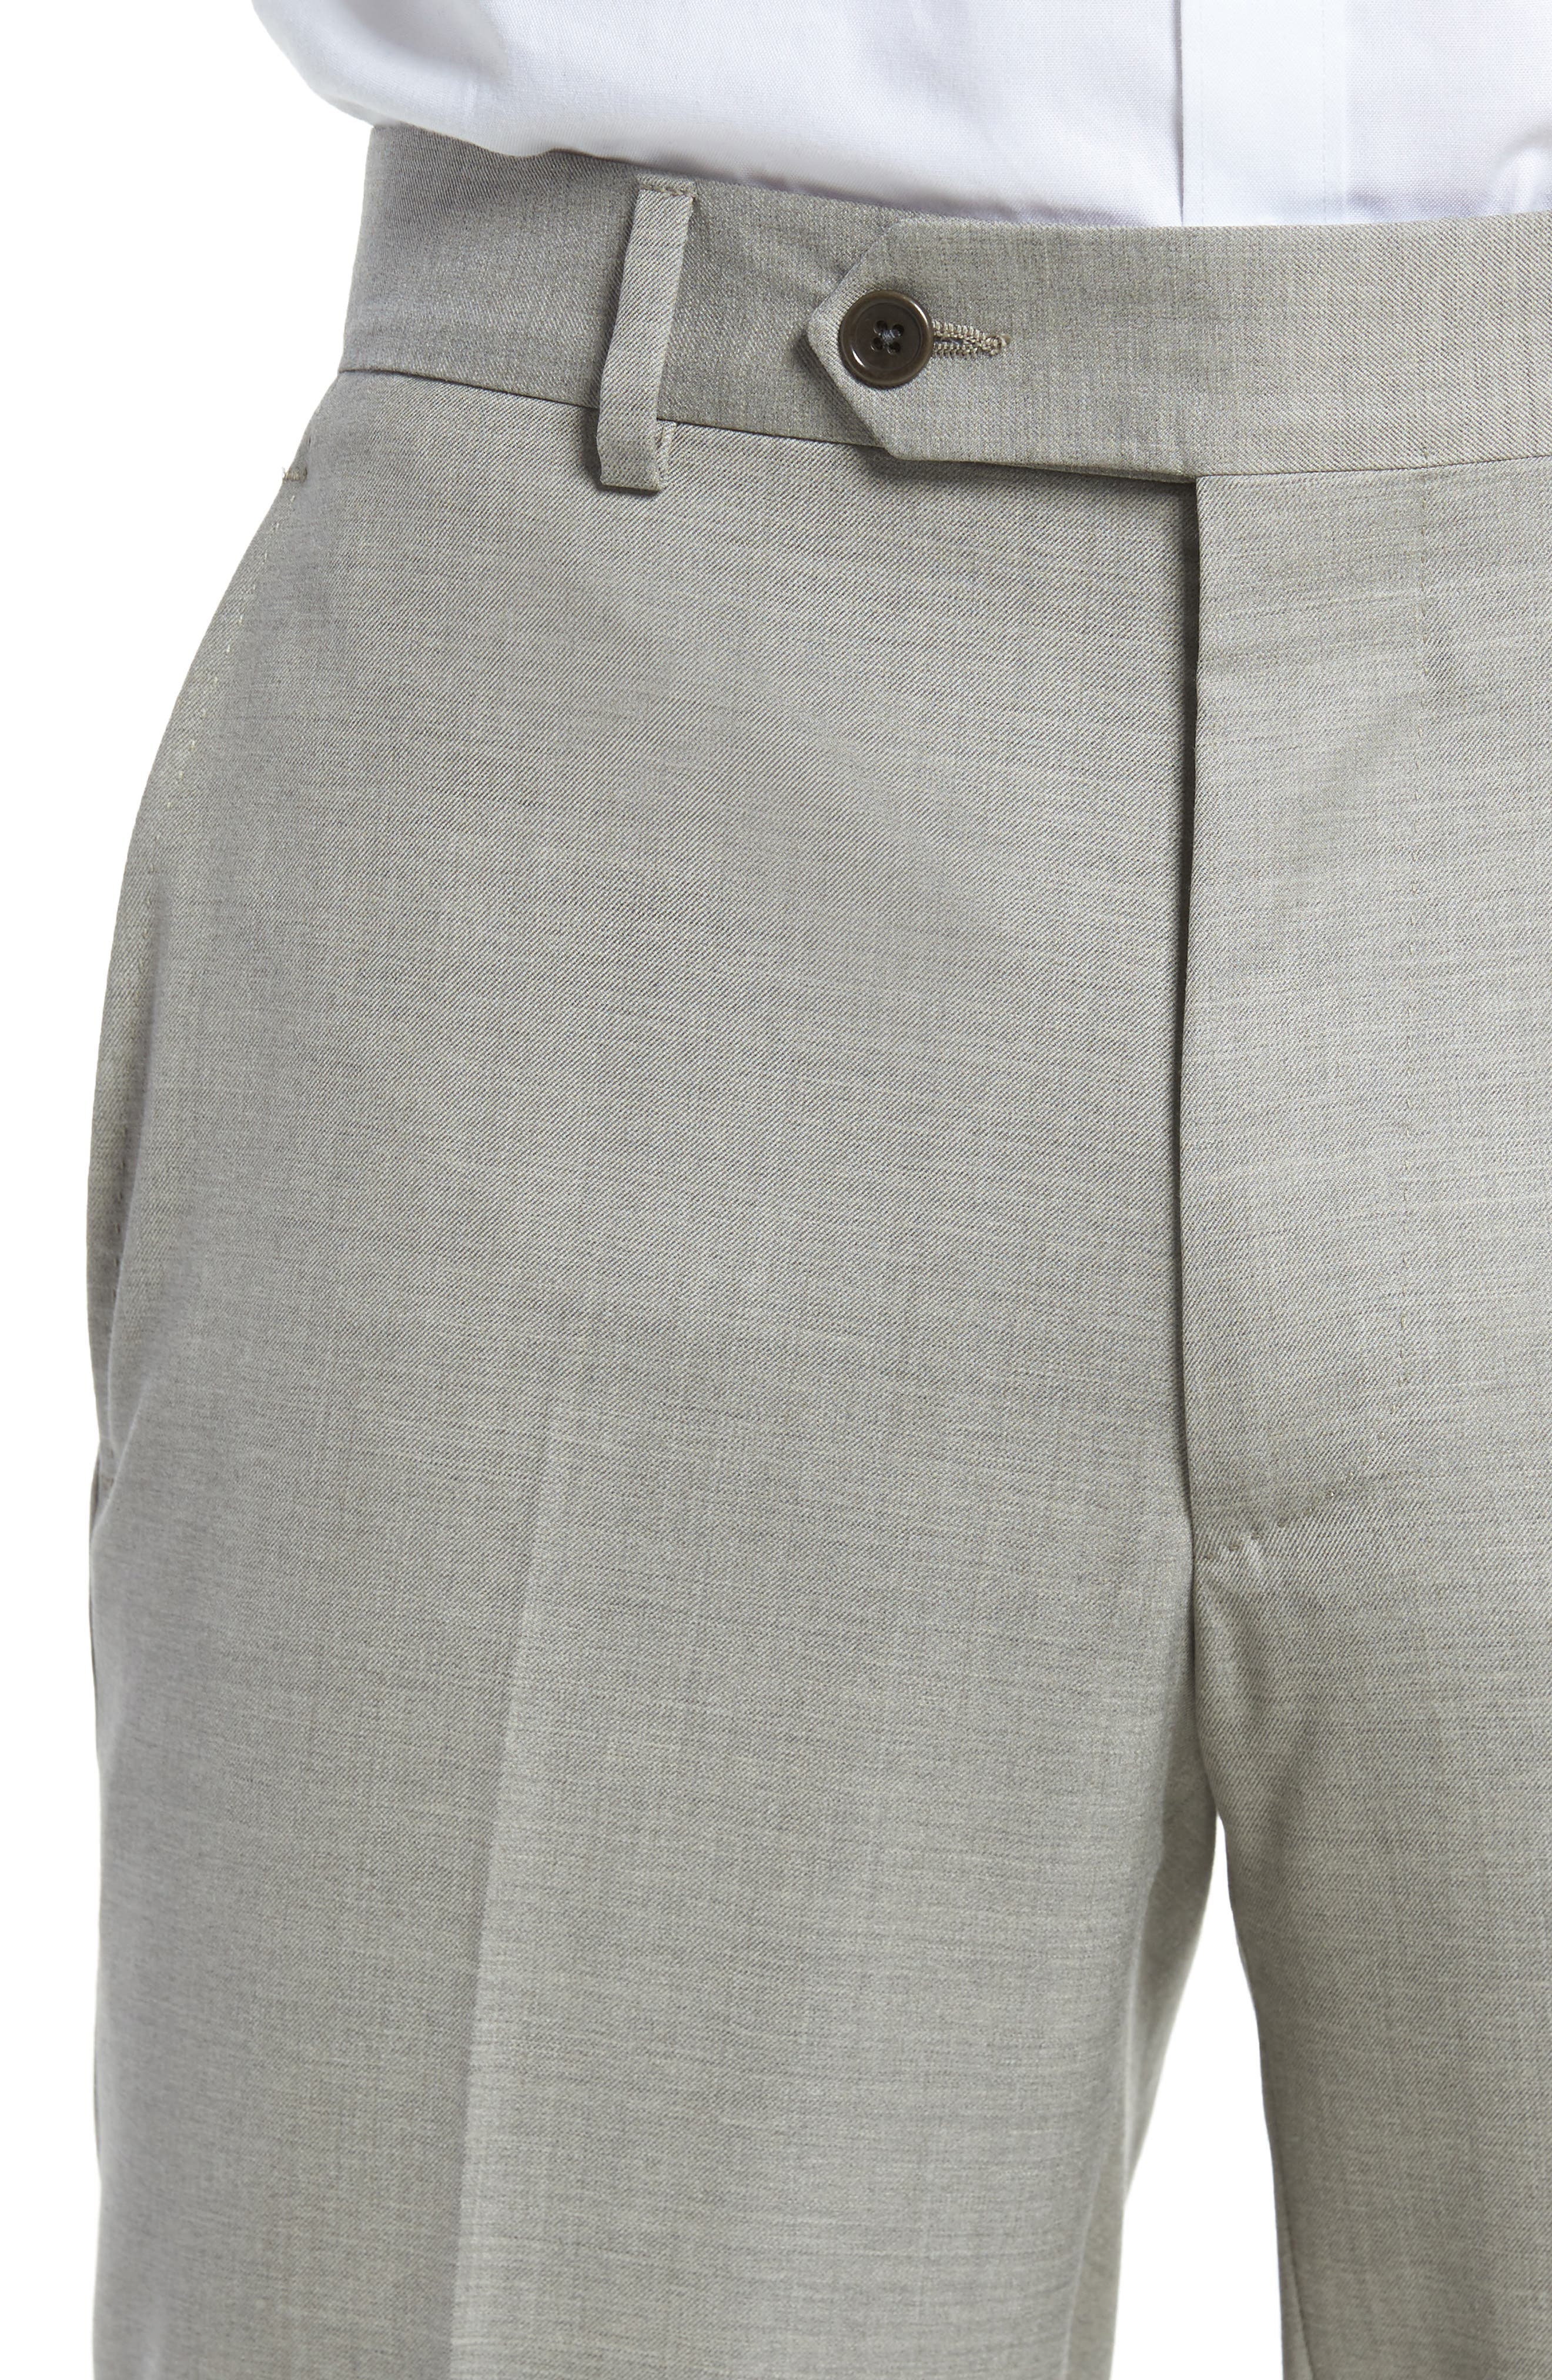 Peter Millar Multi Season Super 150s Wool Flat Front Trousers,                             Alternate thumbnail 4, color,                             Sabbia